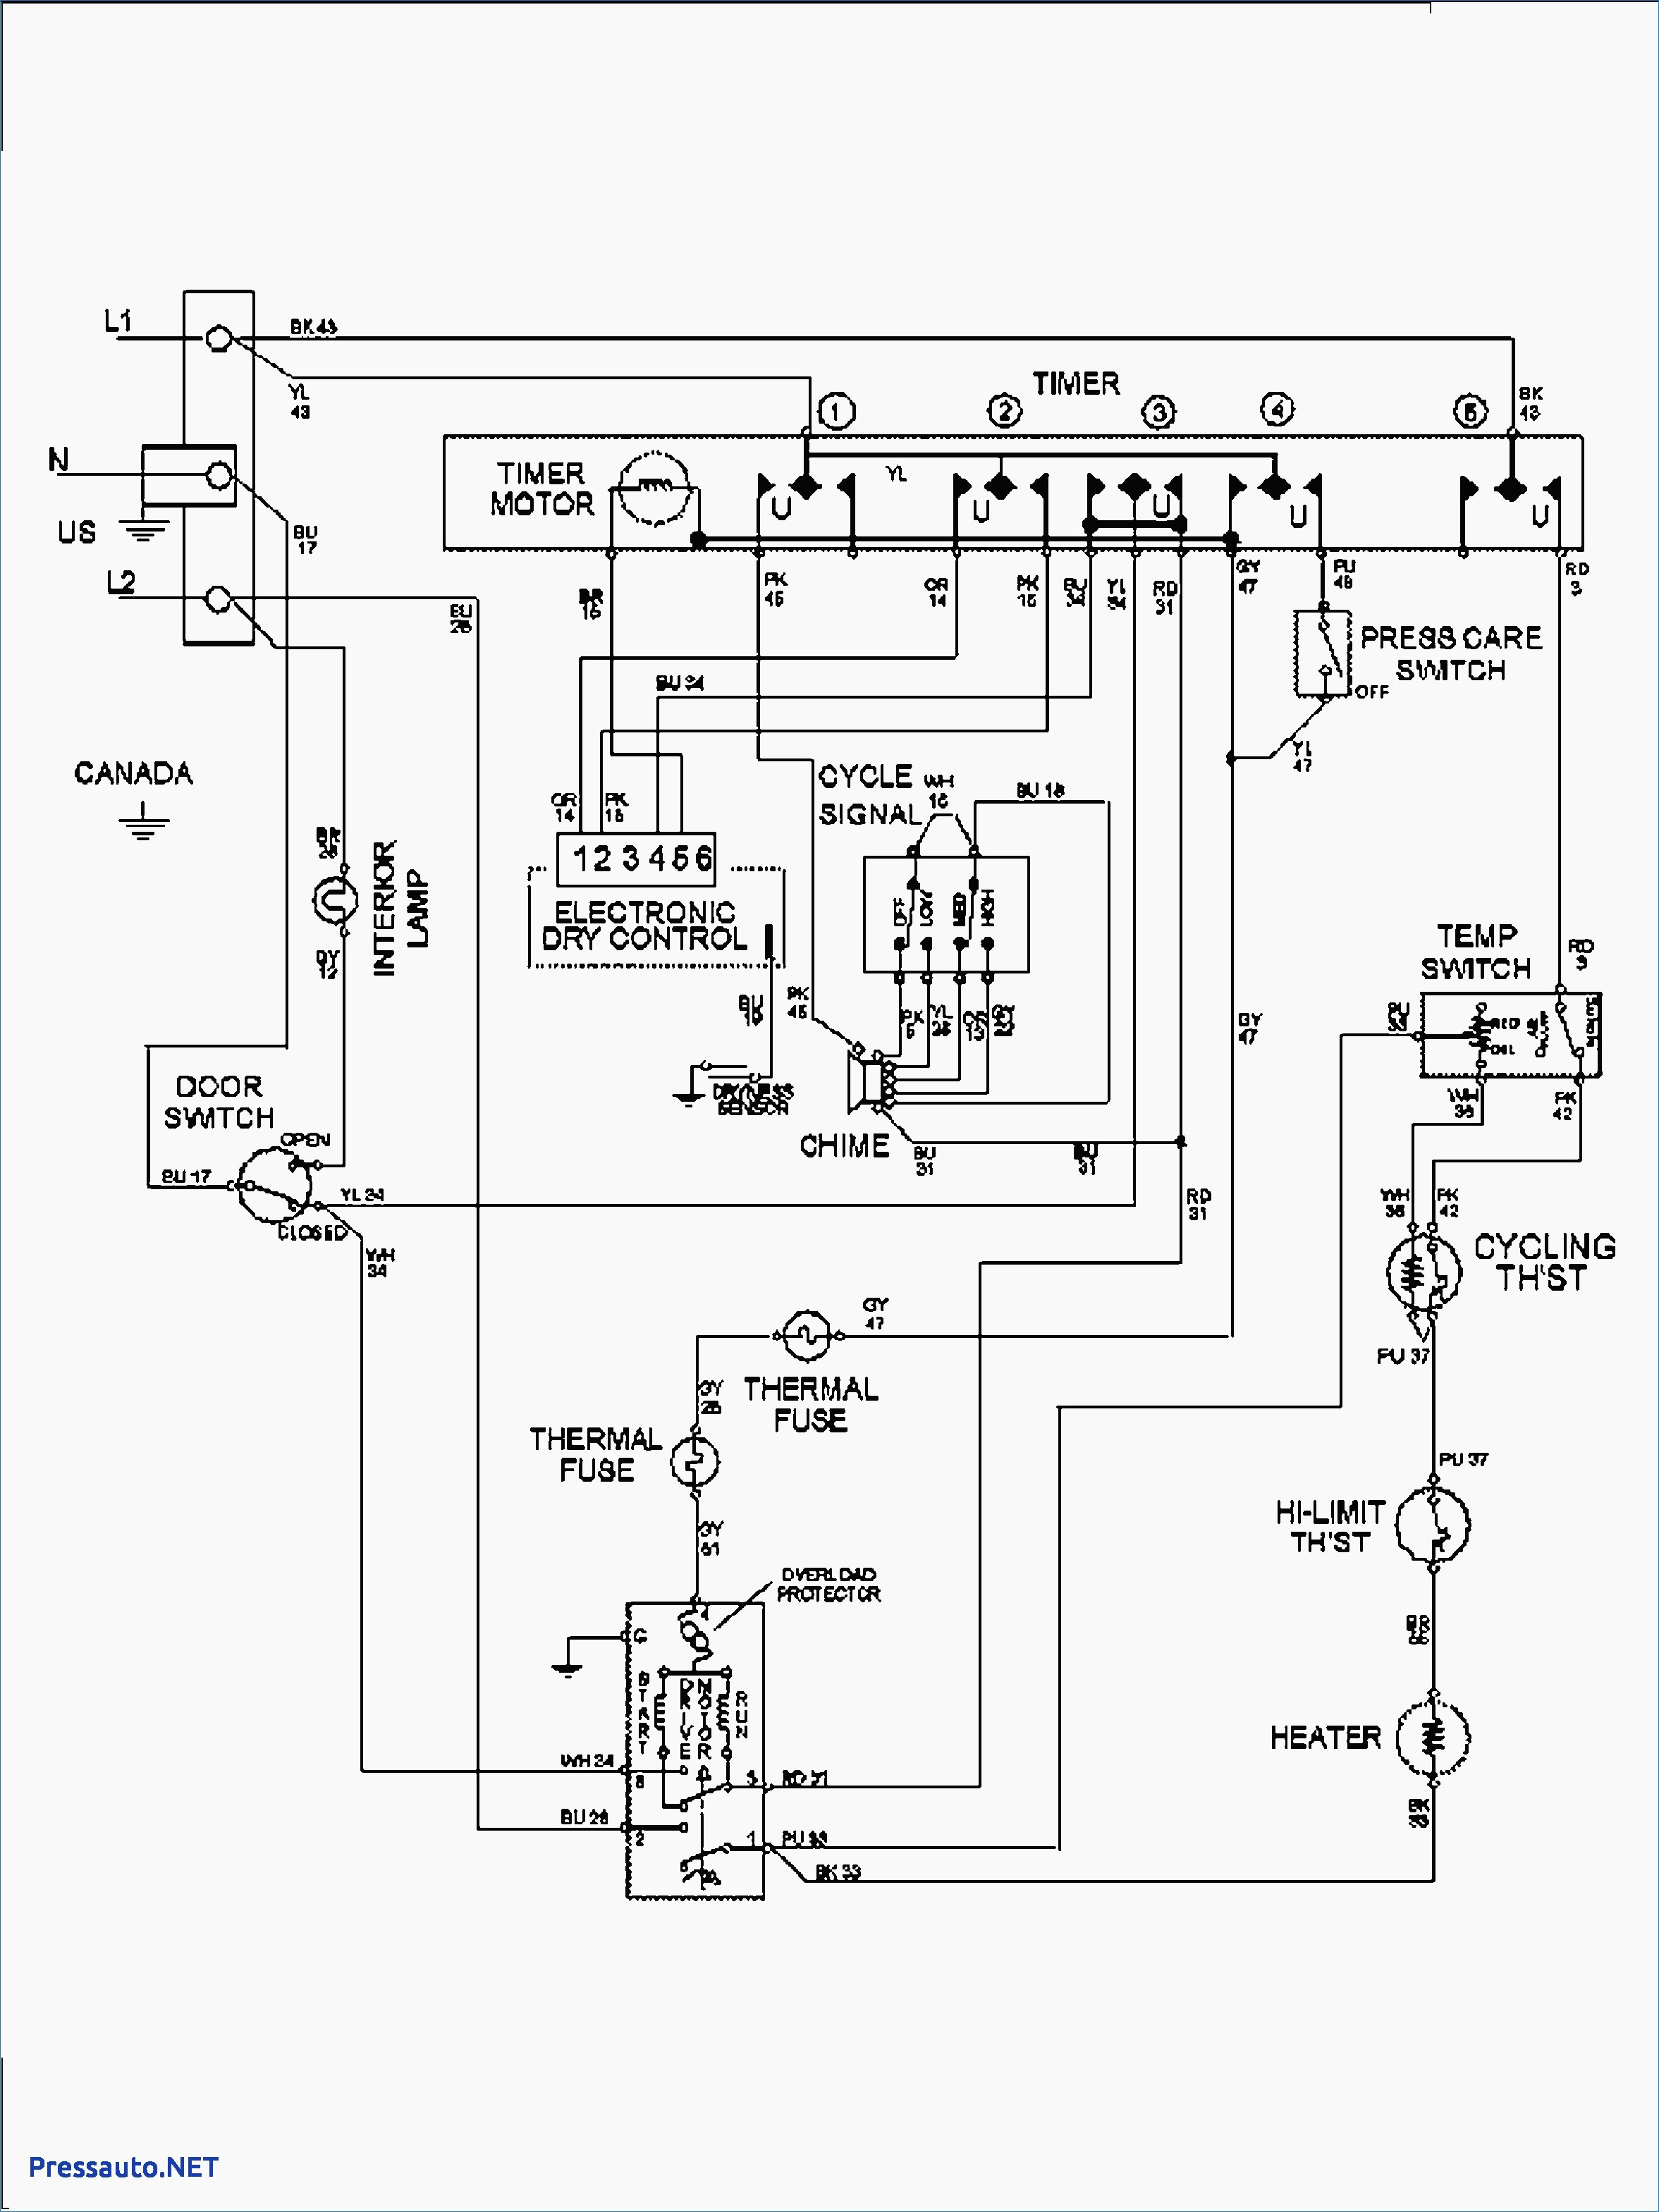 Whirlpool Dryer Plug Wiring Diagram | Releaseganji - Dryer Plug Wiring Diagram